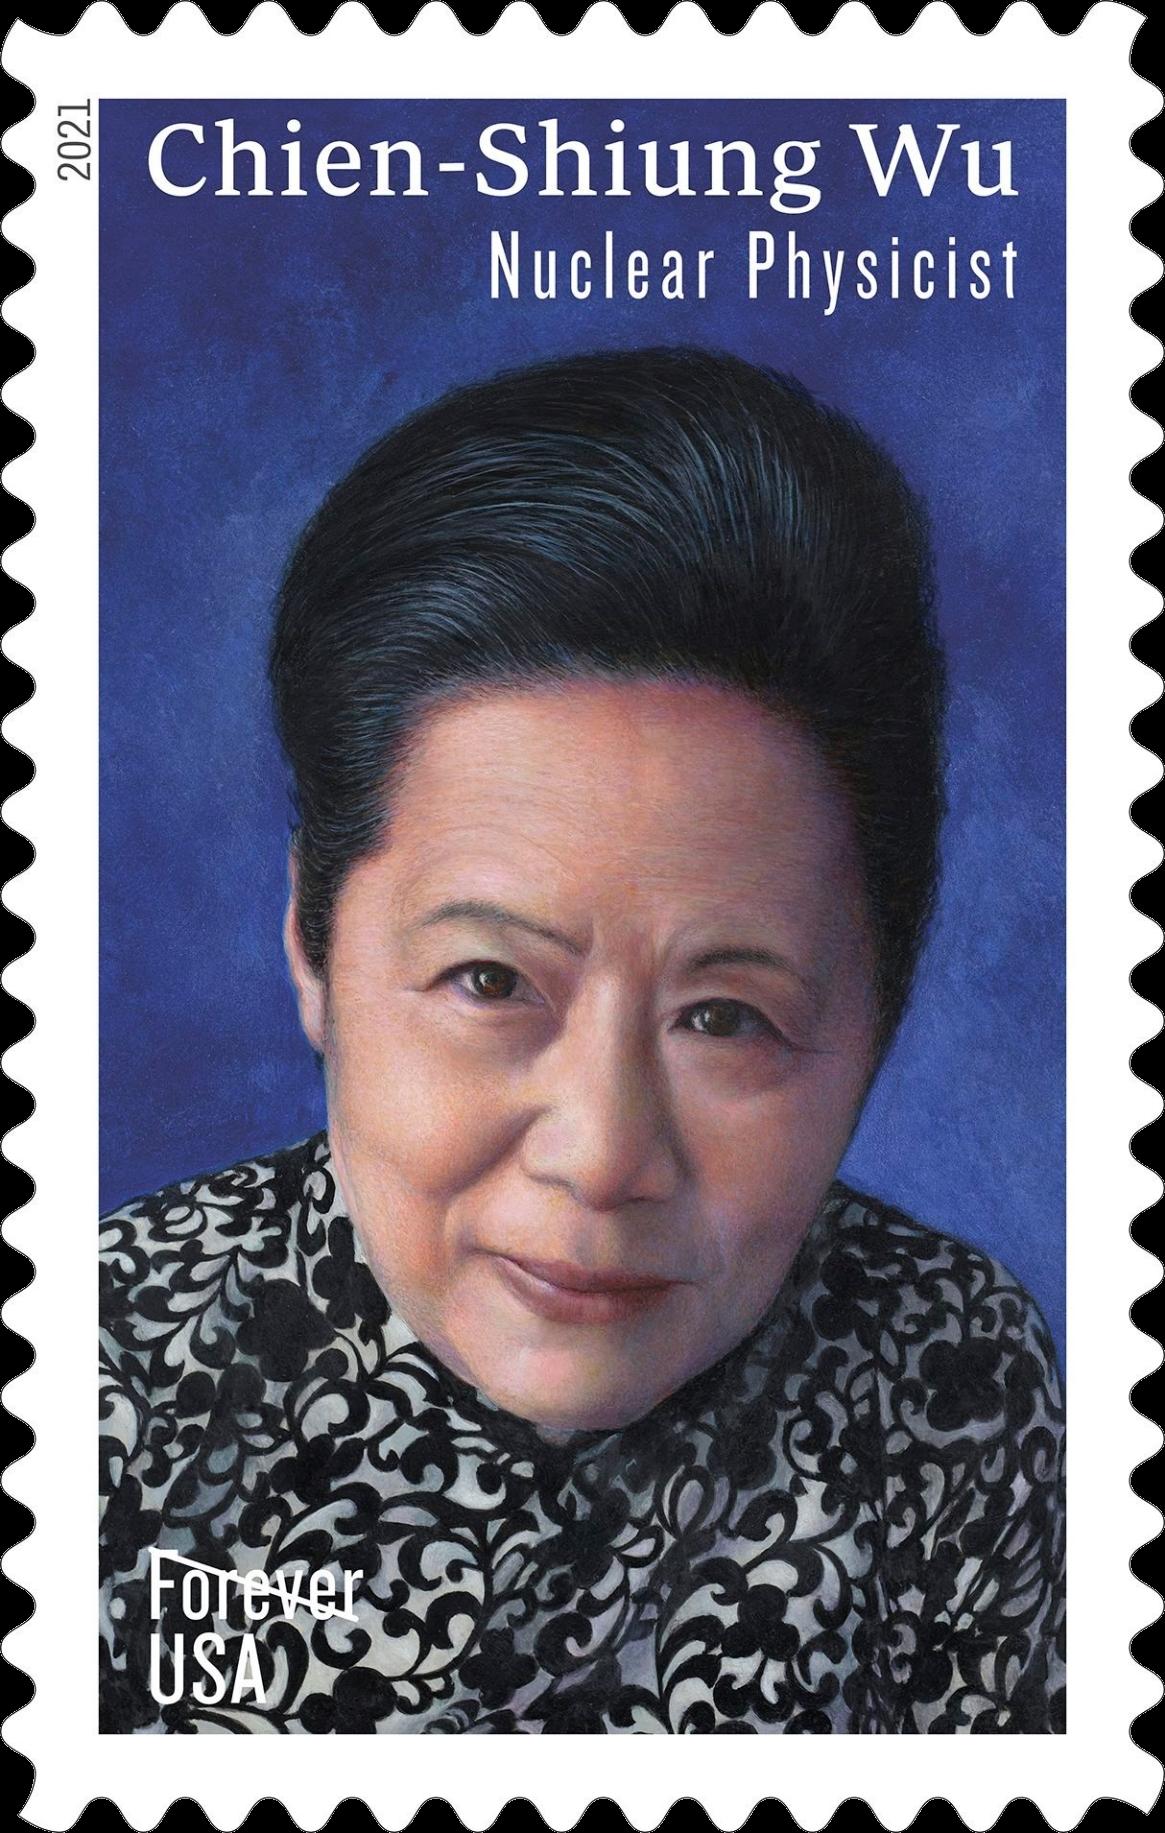 United States: Chien-Shiung Wu, 11 February 2021